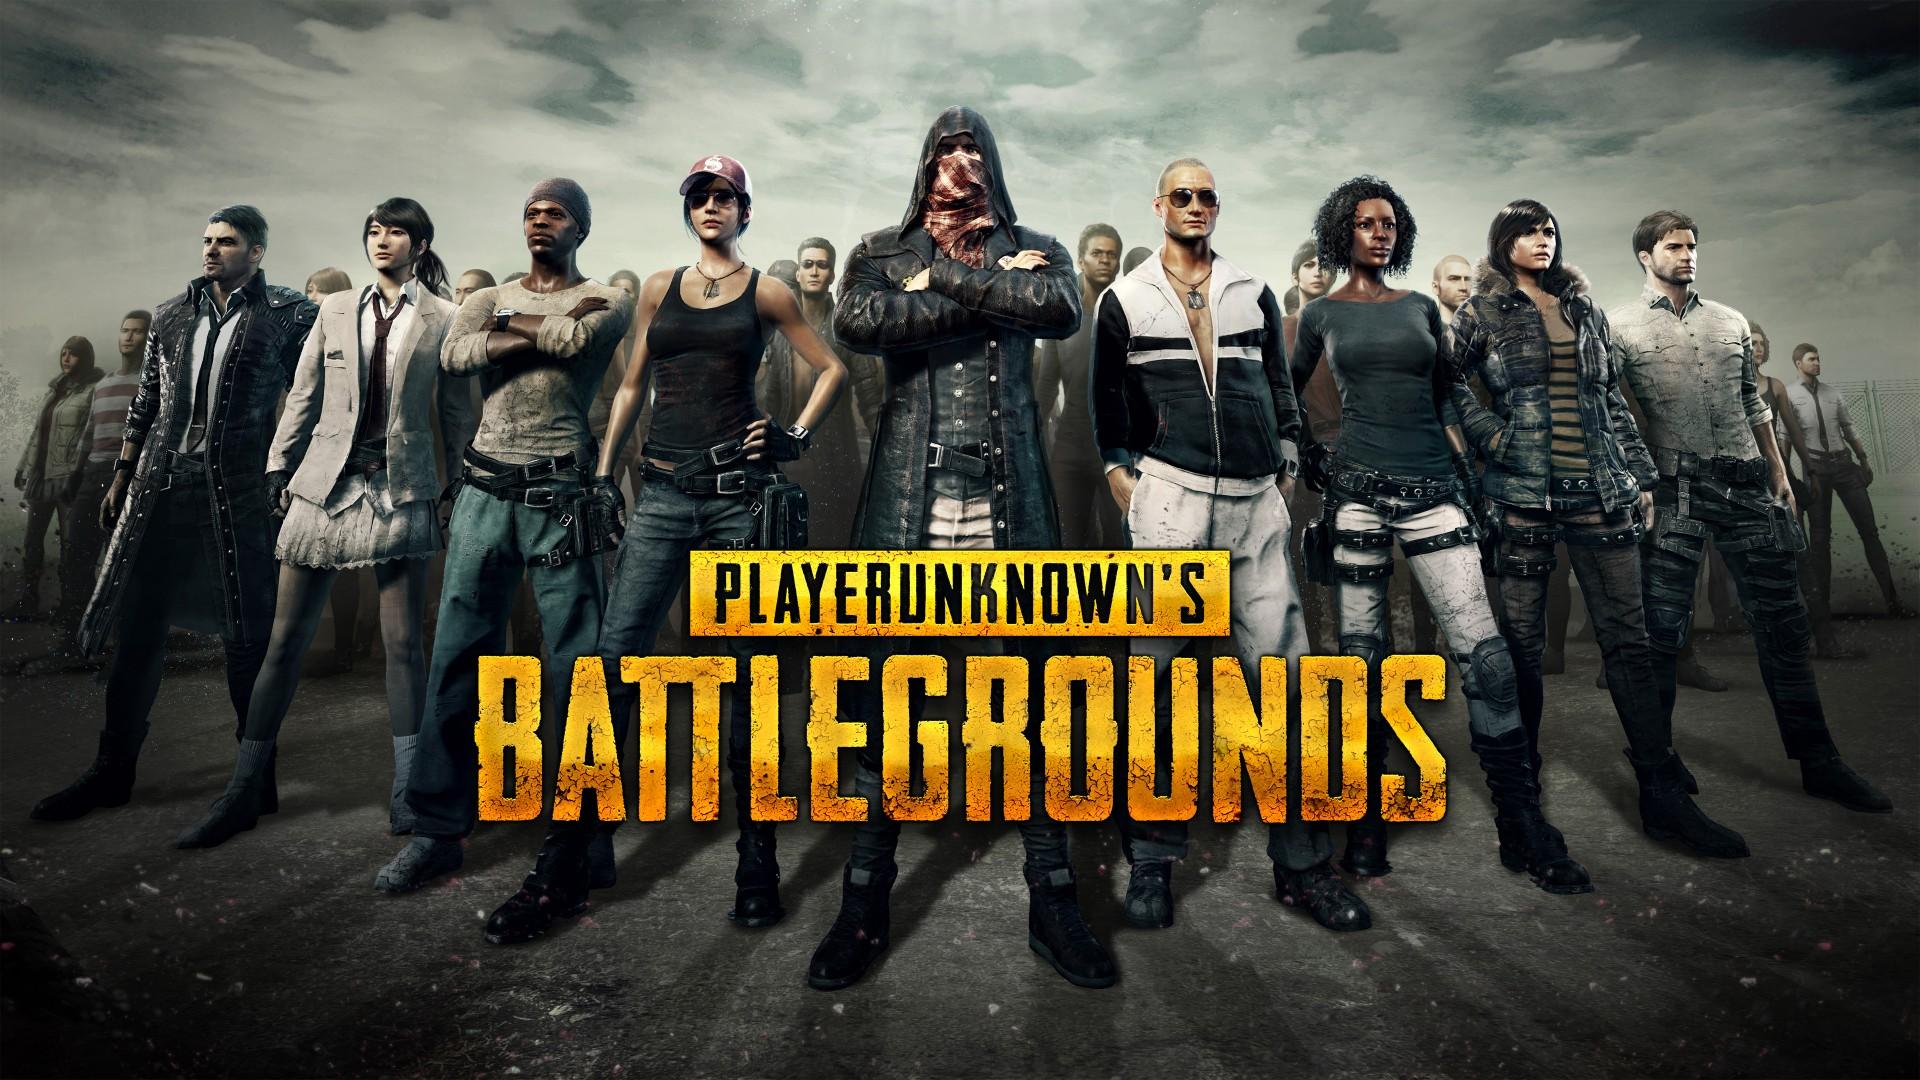 Full Hd God Wallpaper Download Playerunknowns Battlegrounds 4k Wallpapers Hd Wallpapers